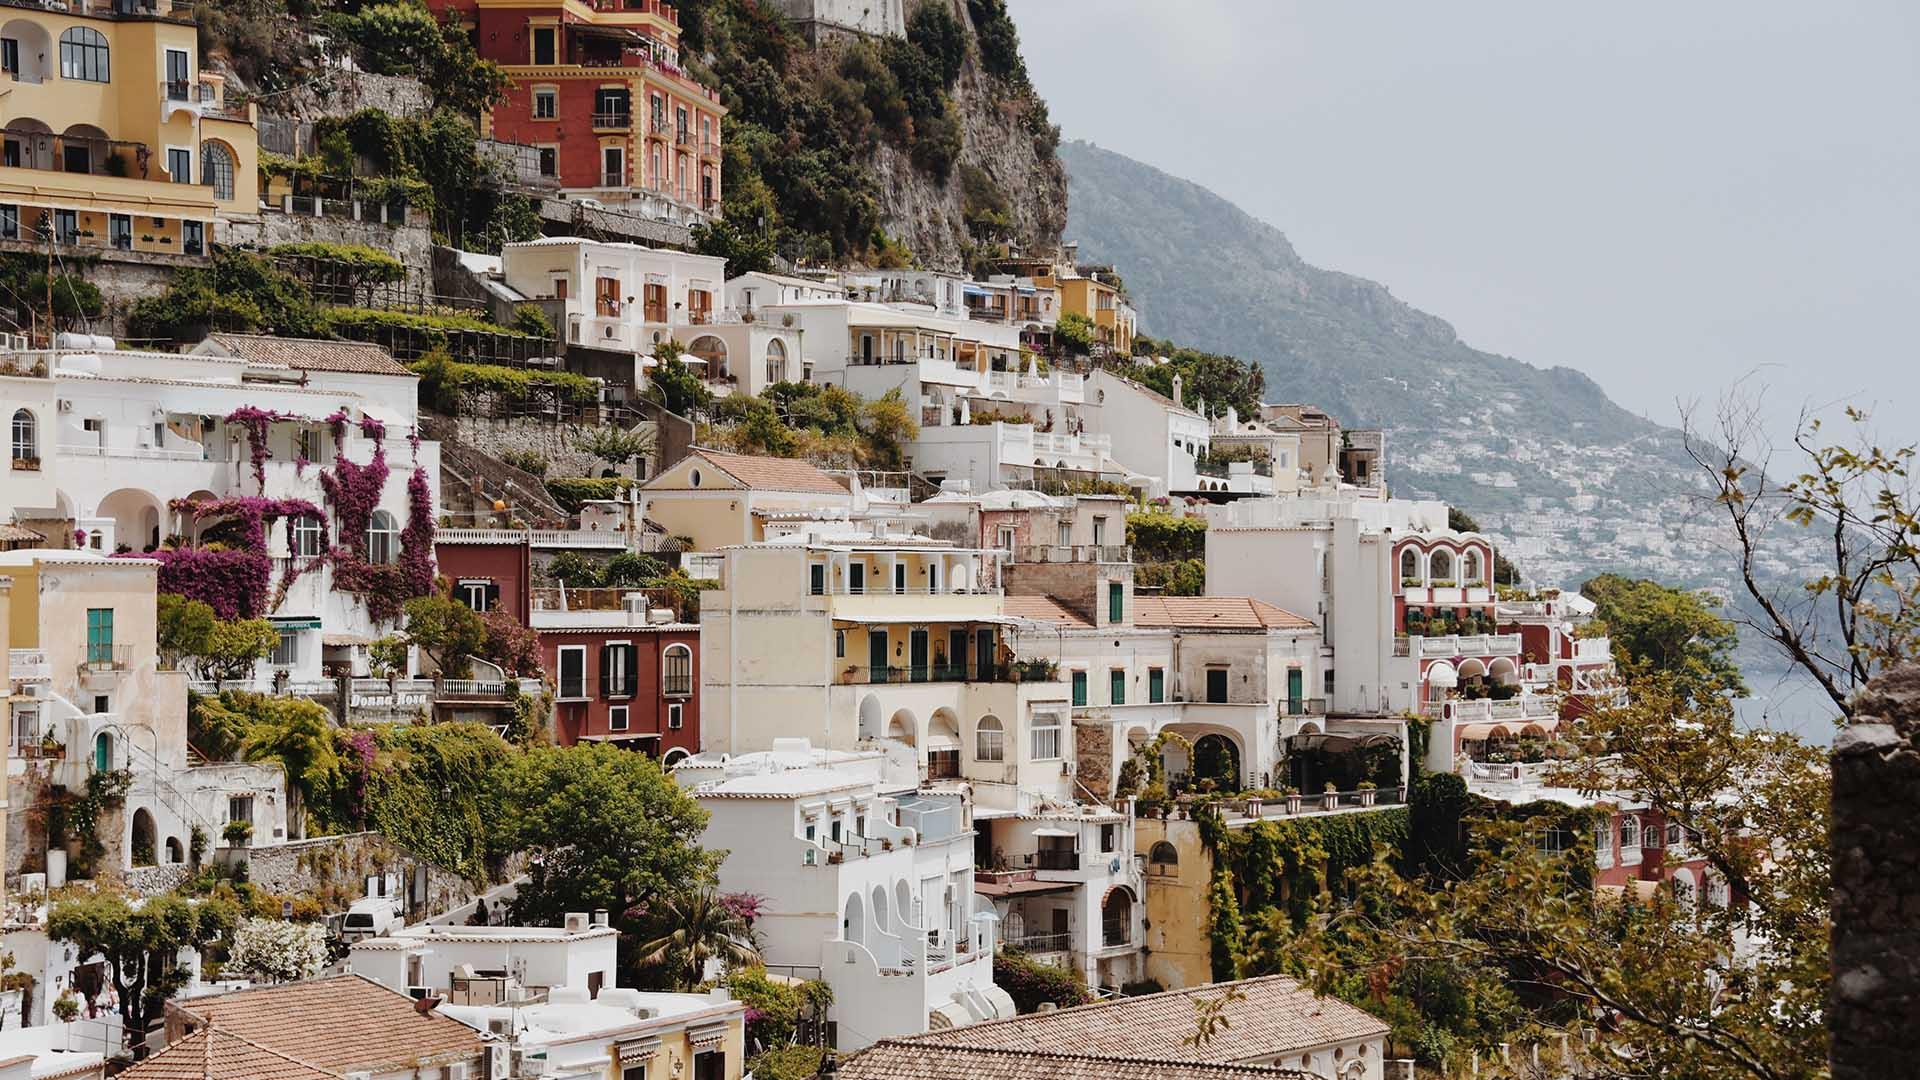 A taste of southern Italy along the Amalfi Coast